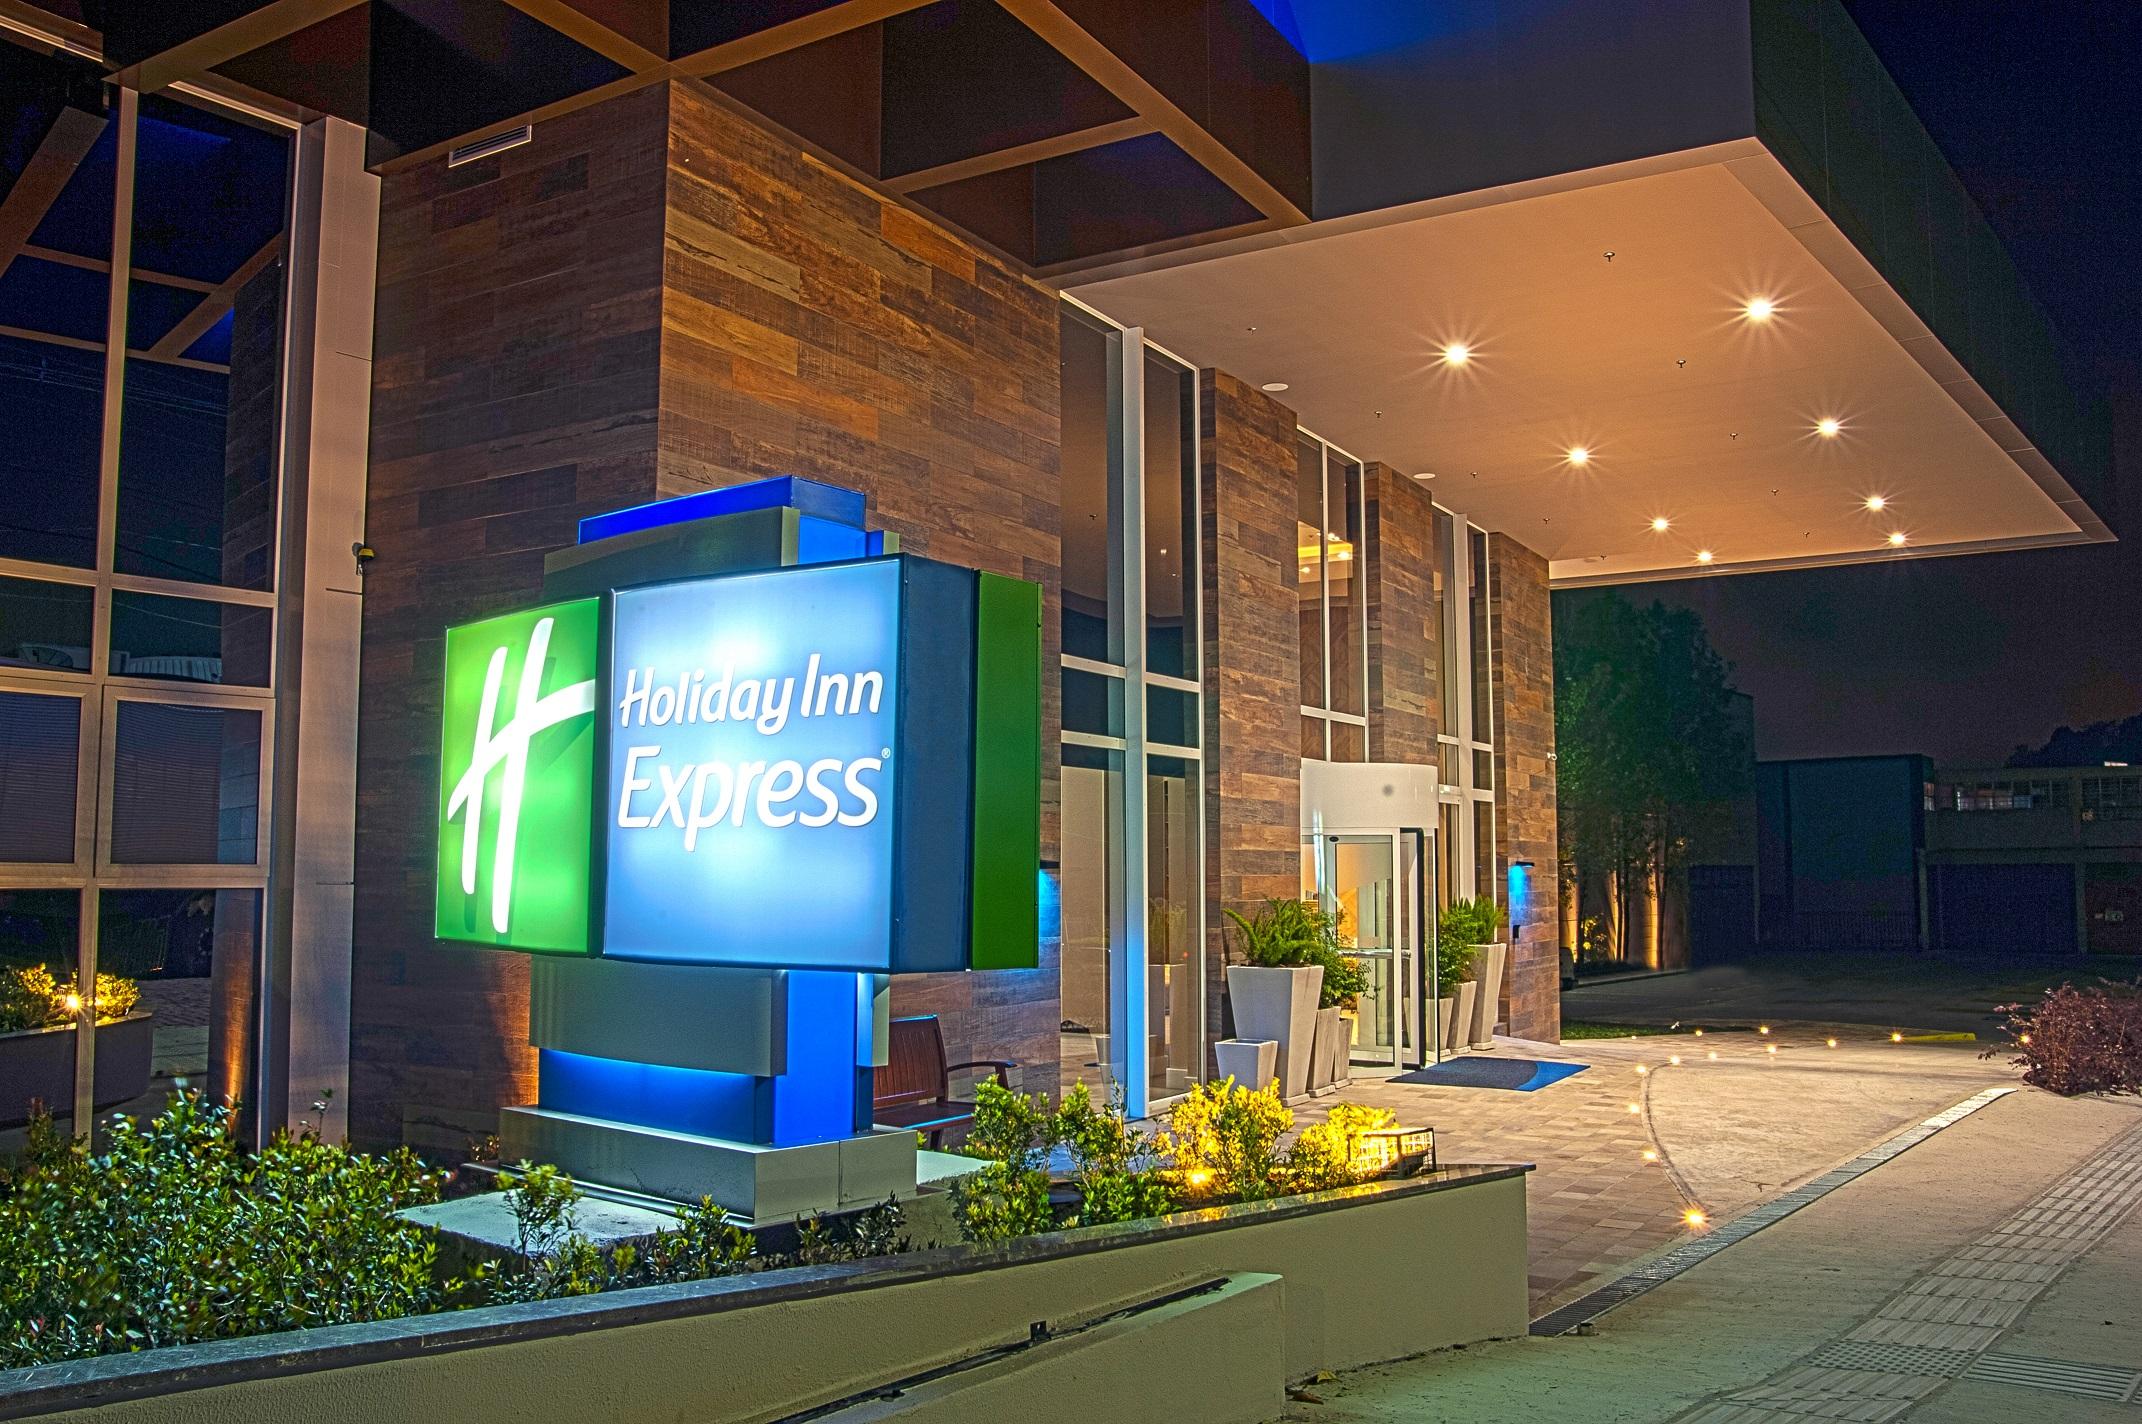 IHG - Holiday Inn Express Farroupilha